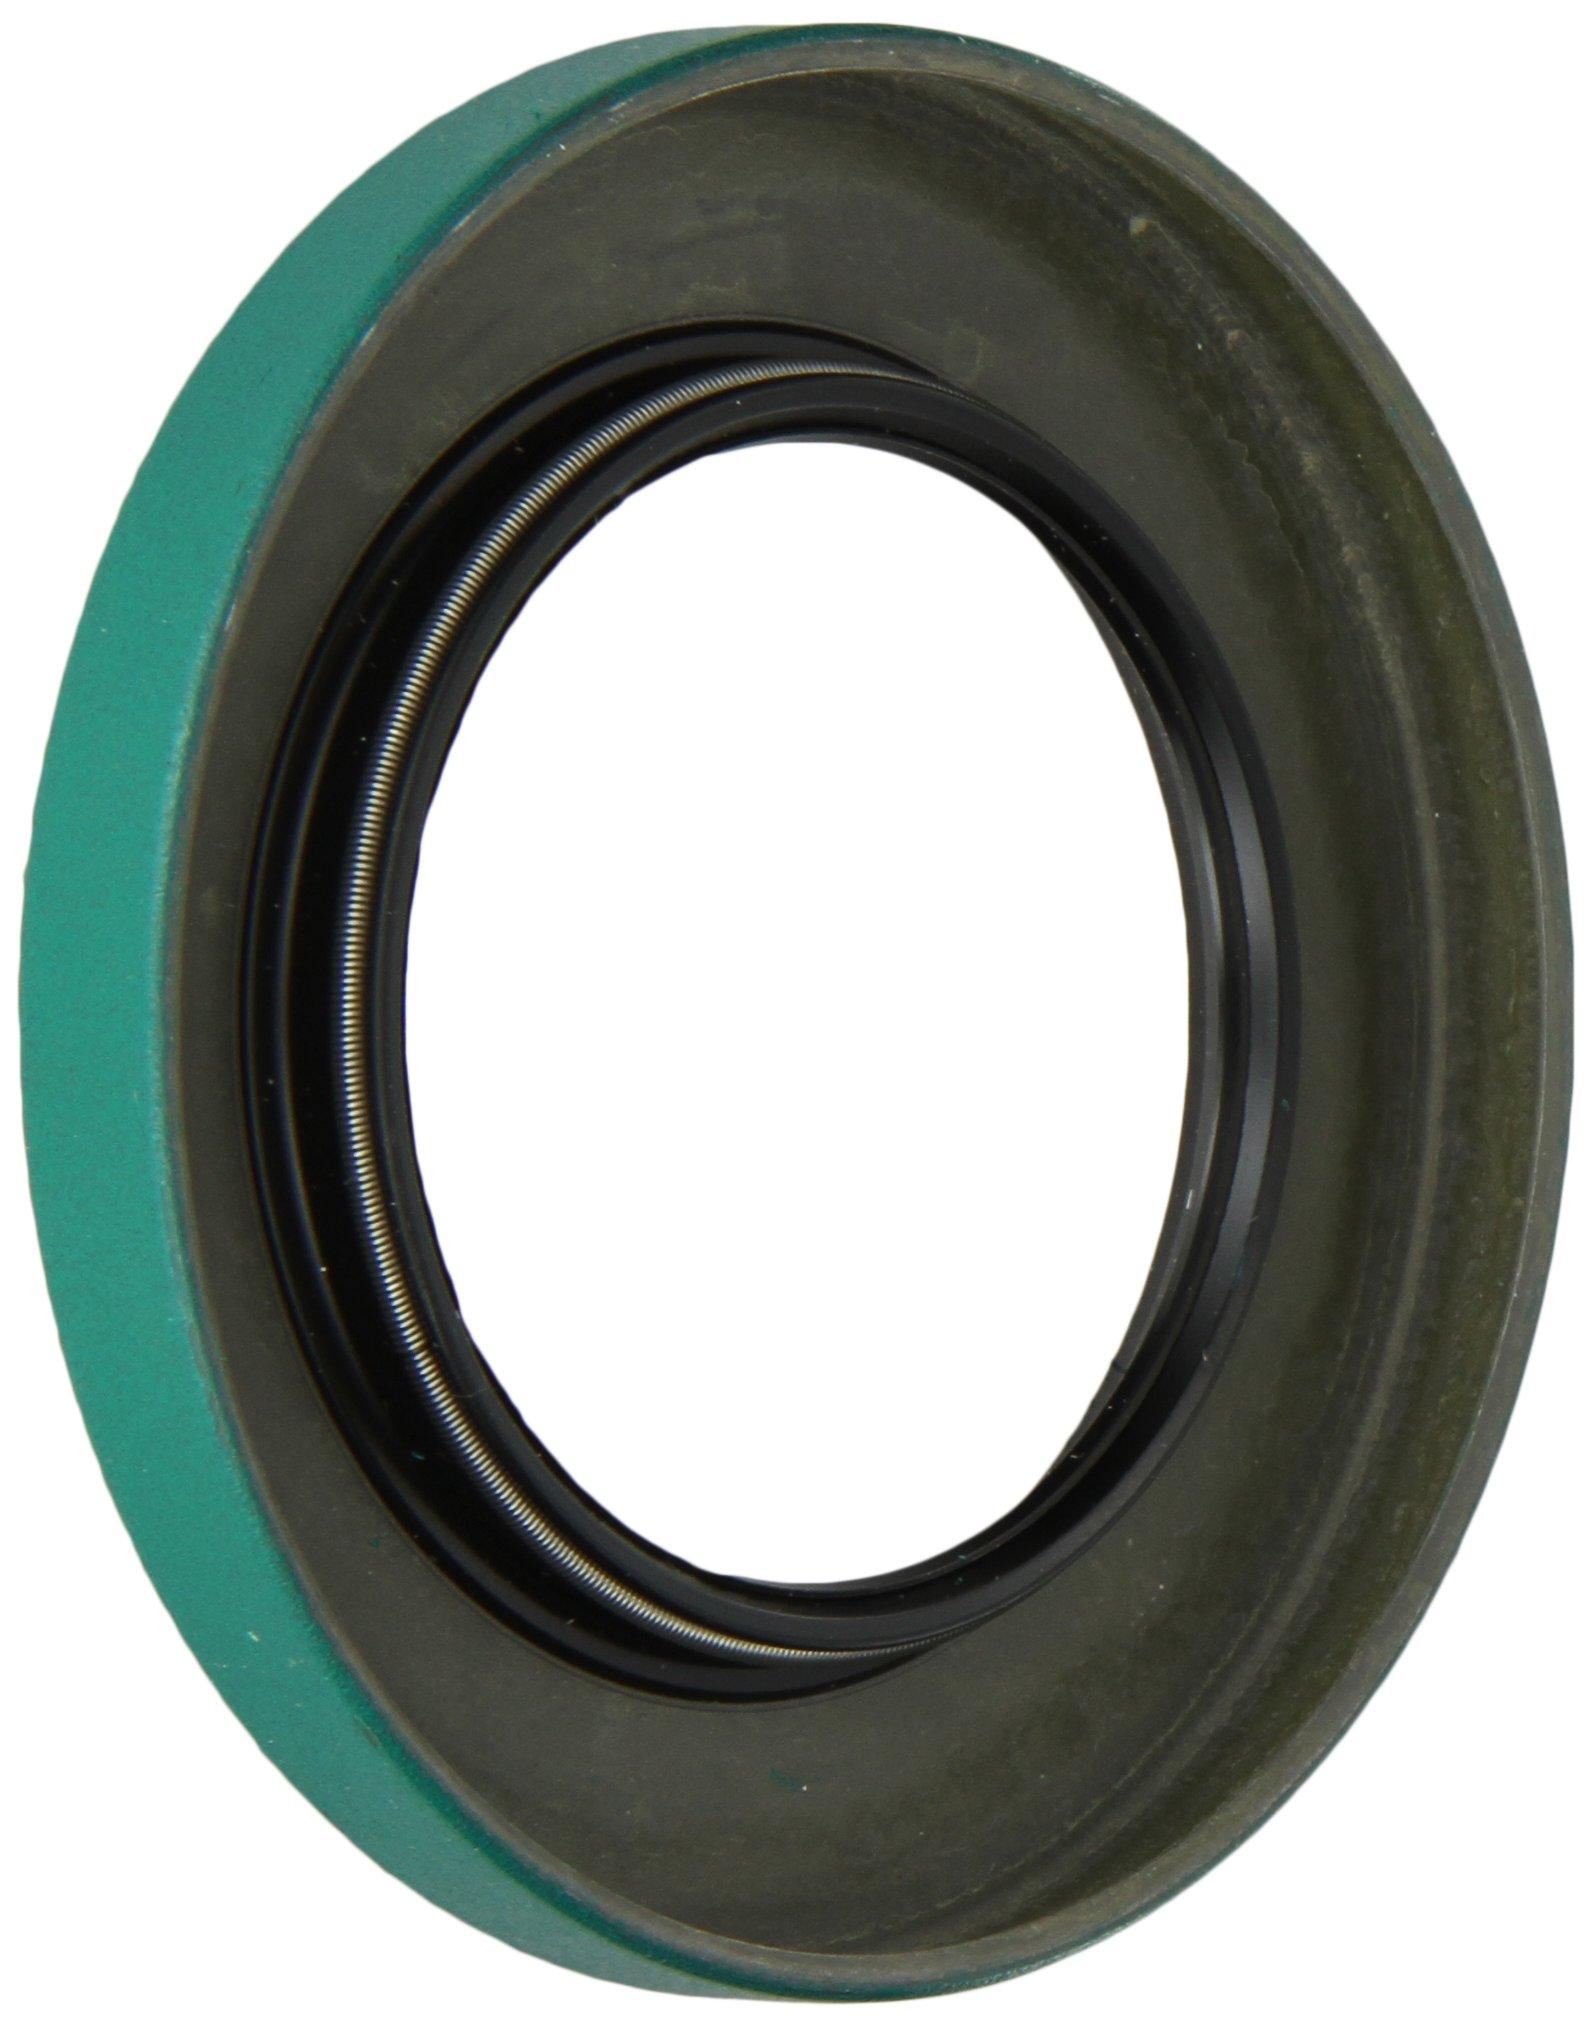 SKF 17653 LDS & Small Bore Seal, R Lip Code, CRW1 Style, Inch, 1.75'' Shaft Diameter, 2.875'' Bore Diameter, 0.313'' Width